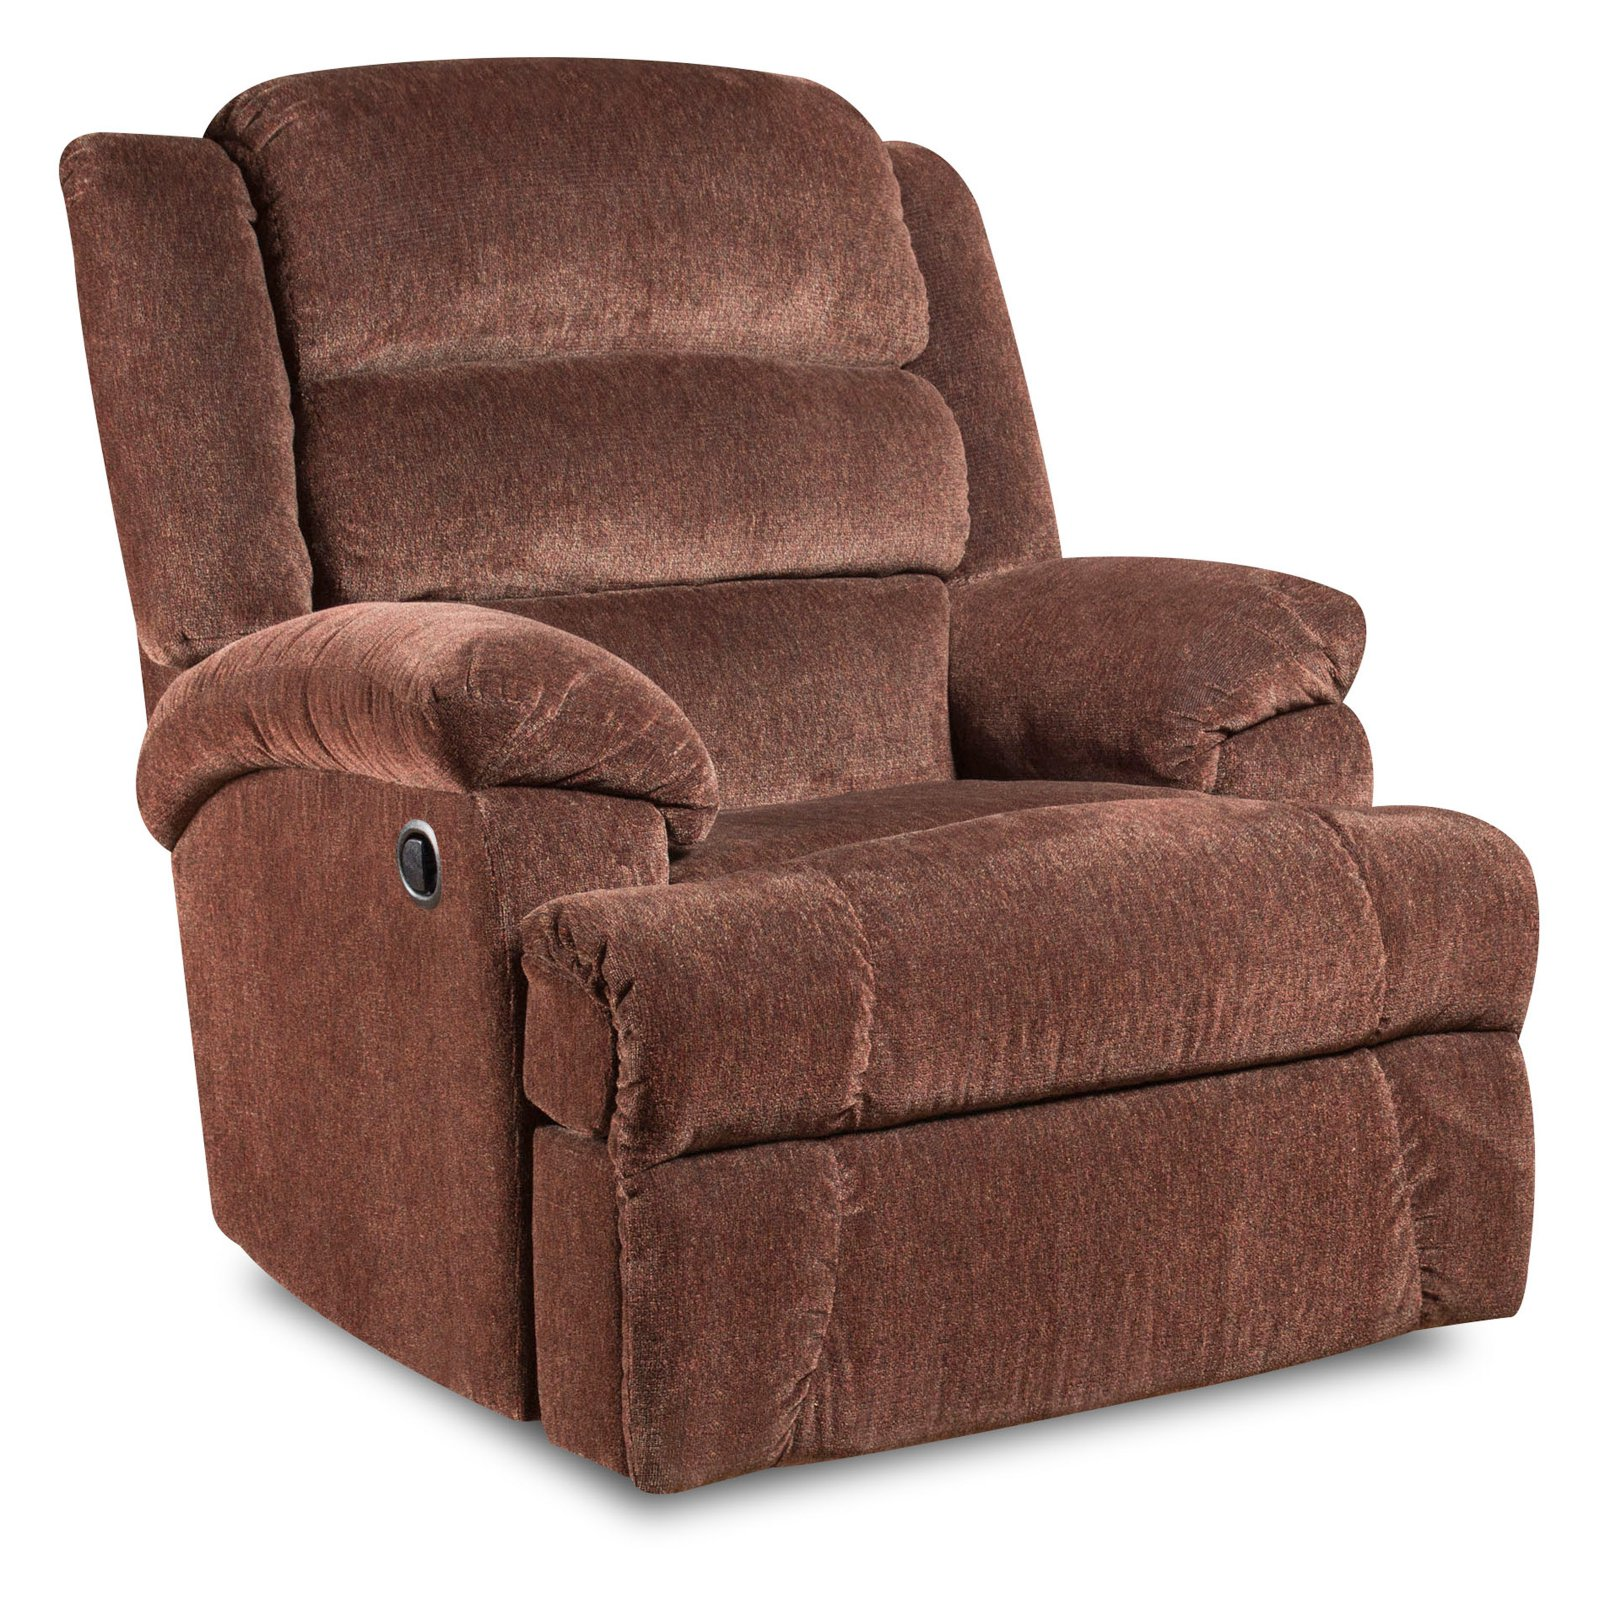 FLASH Furniture Aynsley Microfiber Recliner